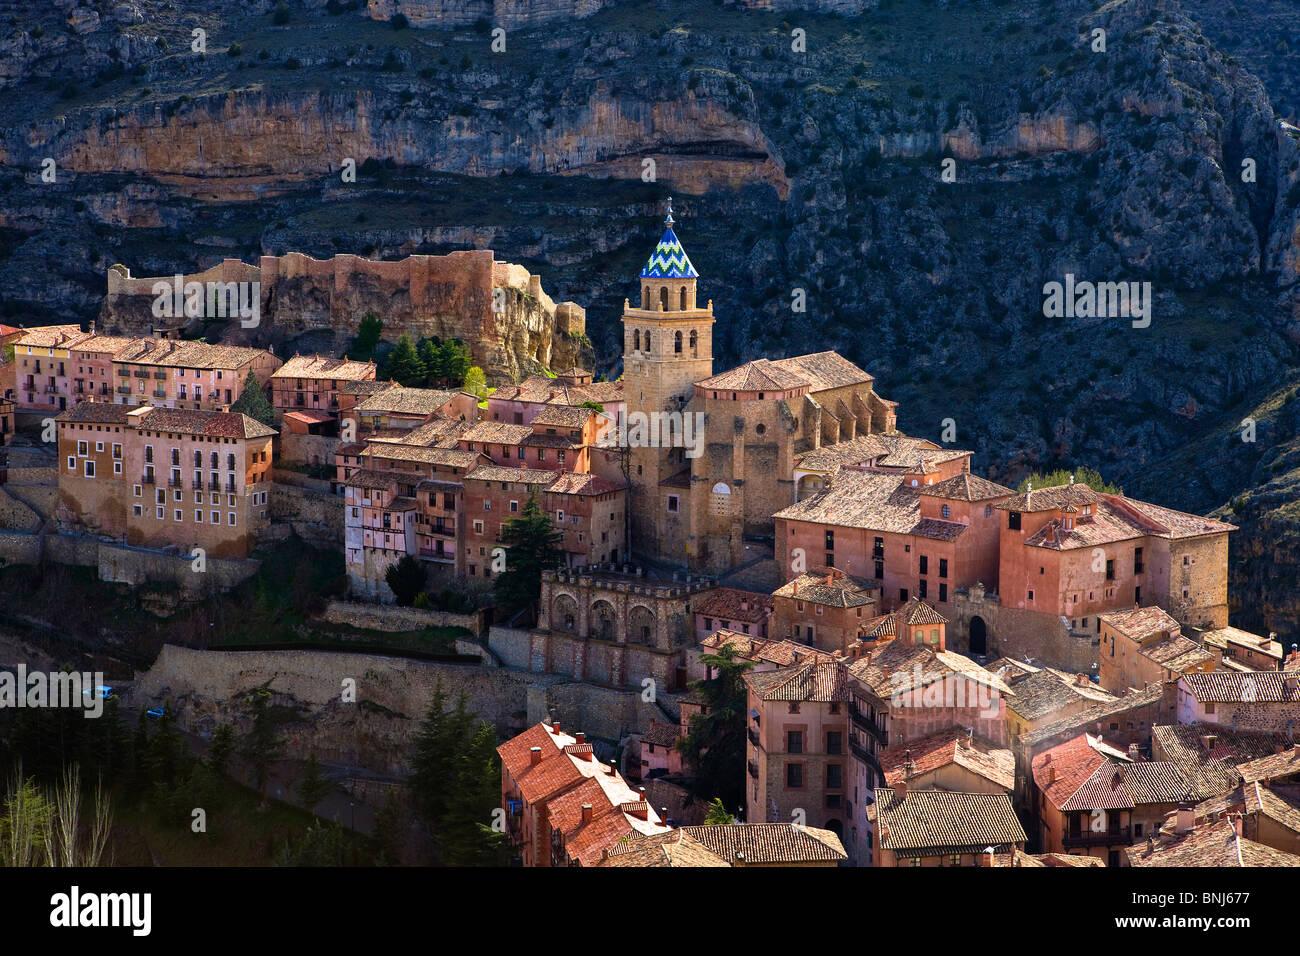 Sell My House Spain Aragon Region Area Teruel Province Albarracin Town